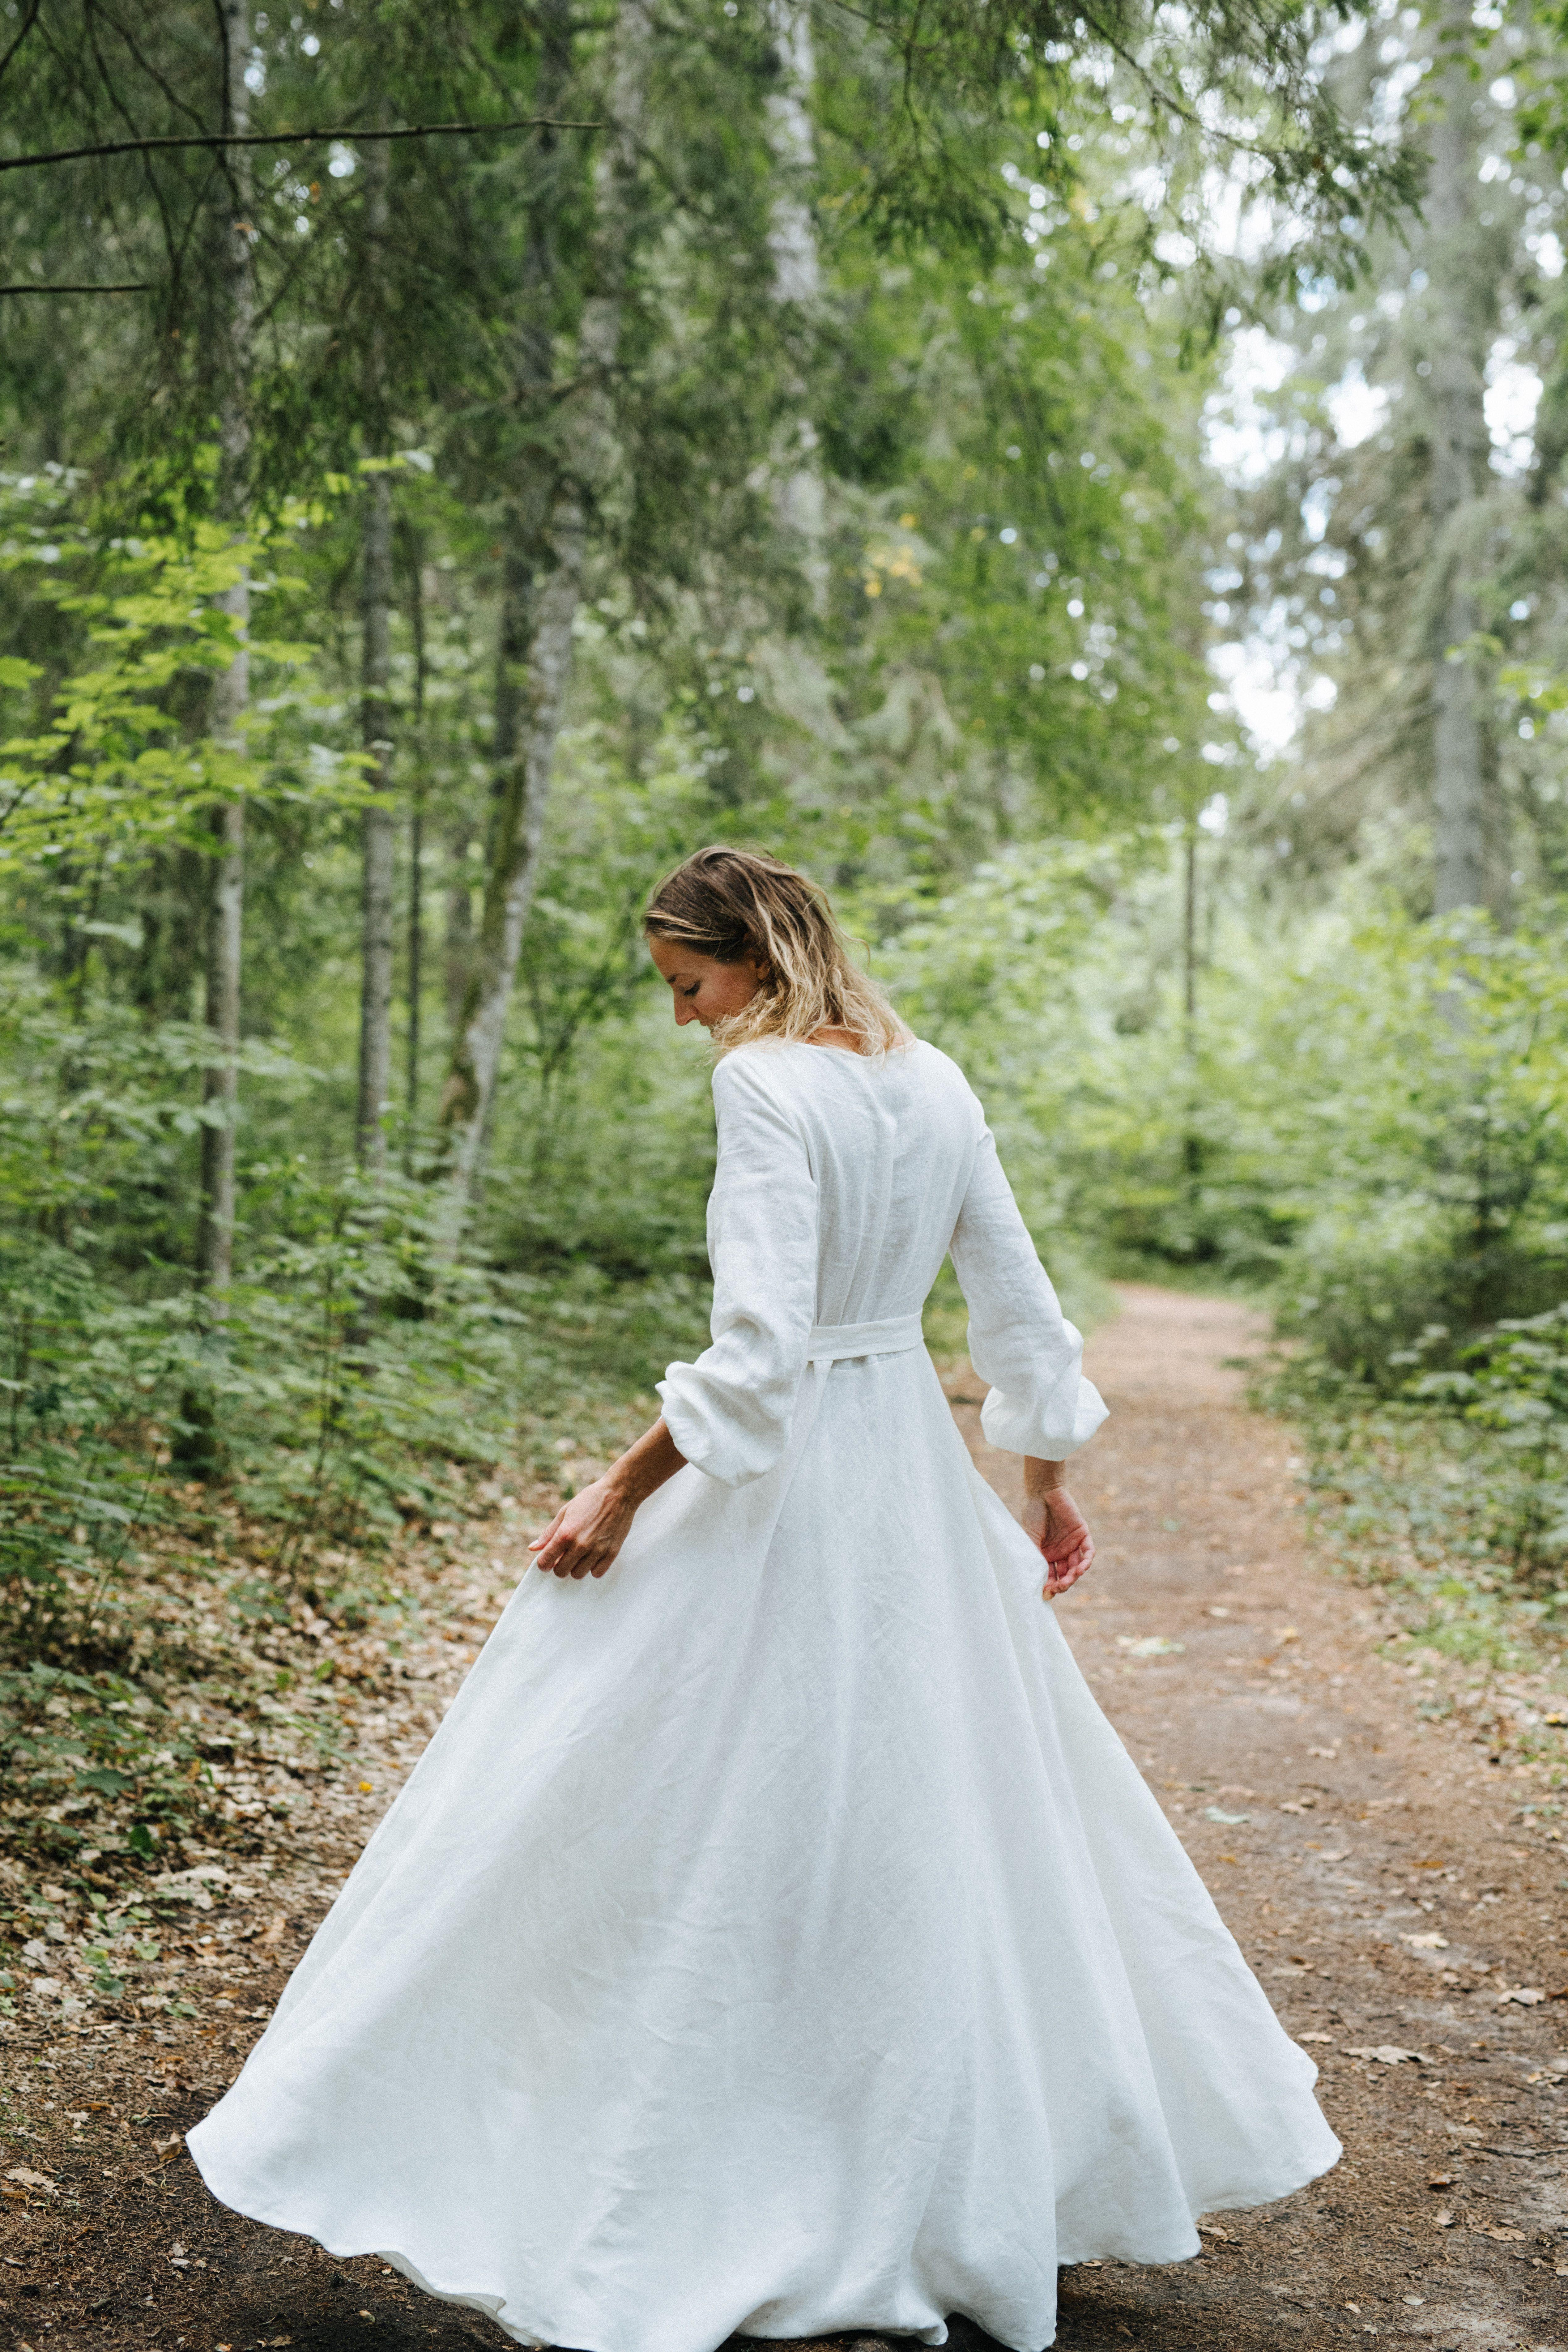 Boho Wedding Dress Linen Wedding Dress Rustic Wedding Dress Classic Wedding Dress Wide Skirt Wedding Dress White Wedding Dress Etsy Wedding Dress Wedding Dresses Boho Wedding Dress